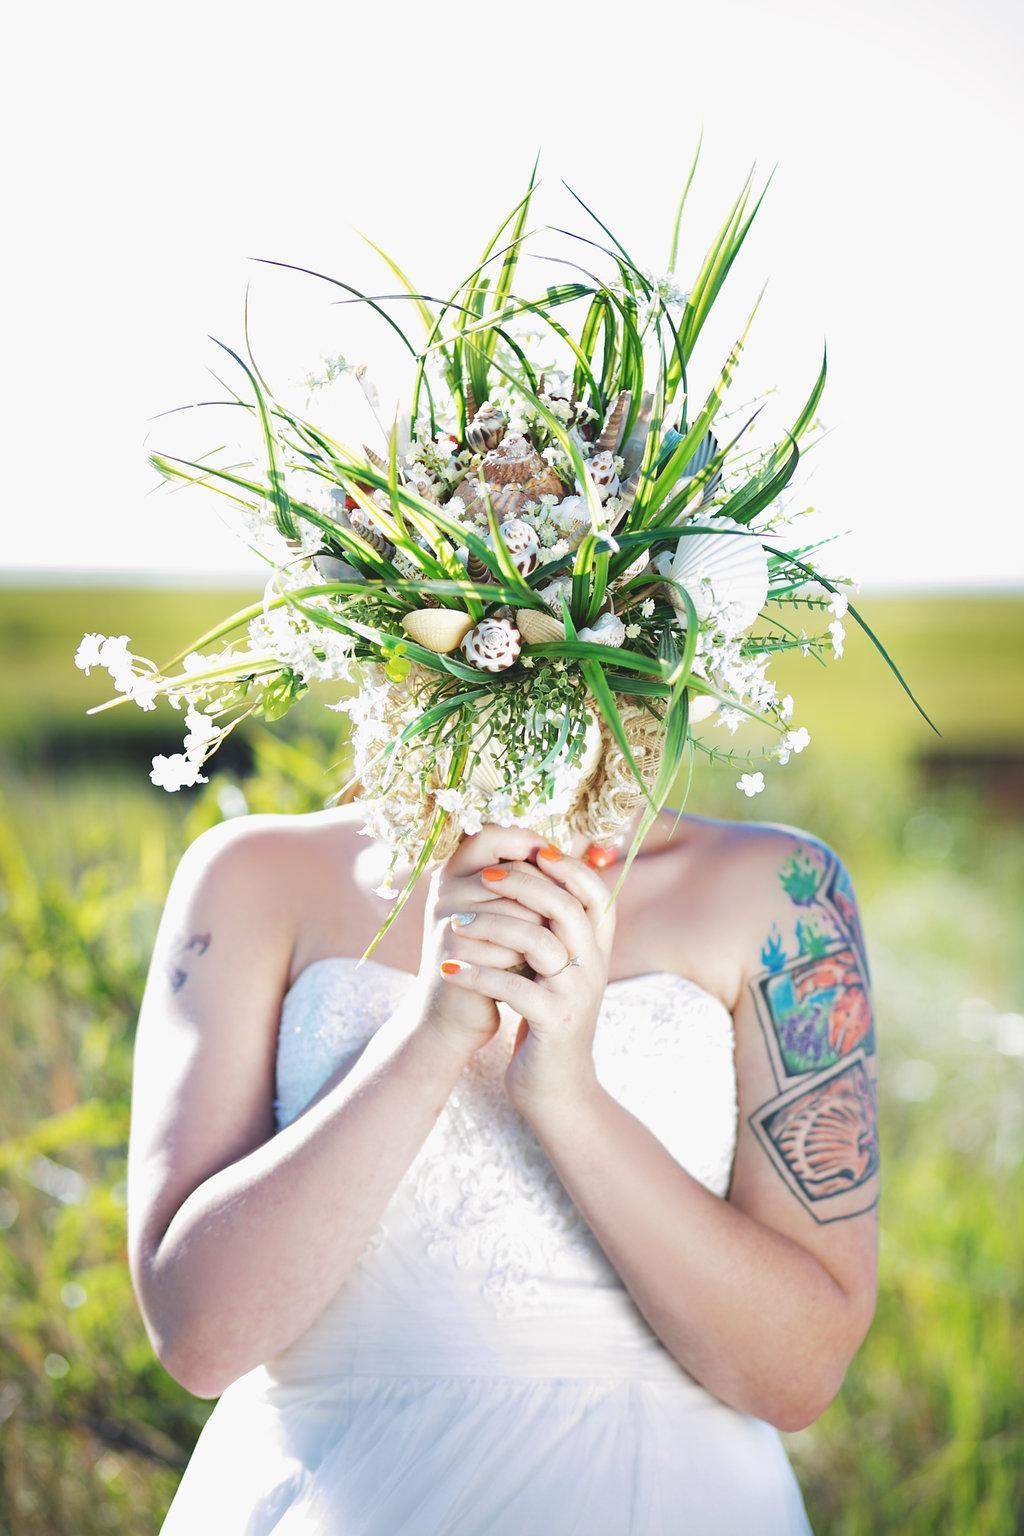 Laura + Matt Featured DIY Wedding // The Overwhelmed Bride Bridal Lifestyle + Wedding Blog // Bridal Bouquet